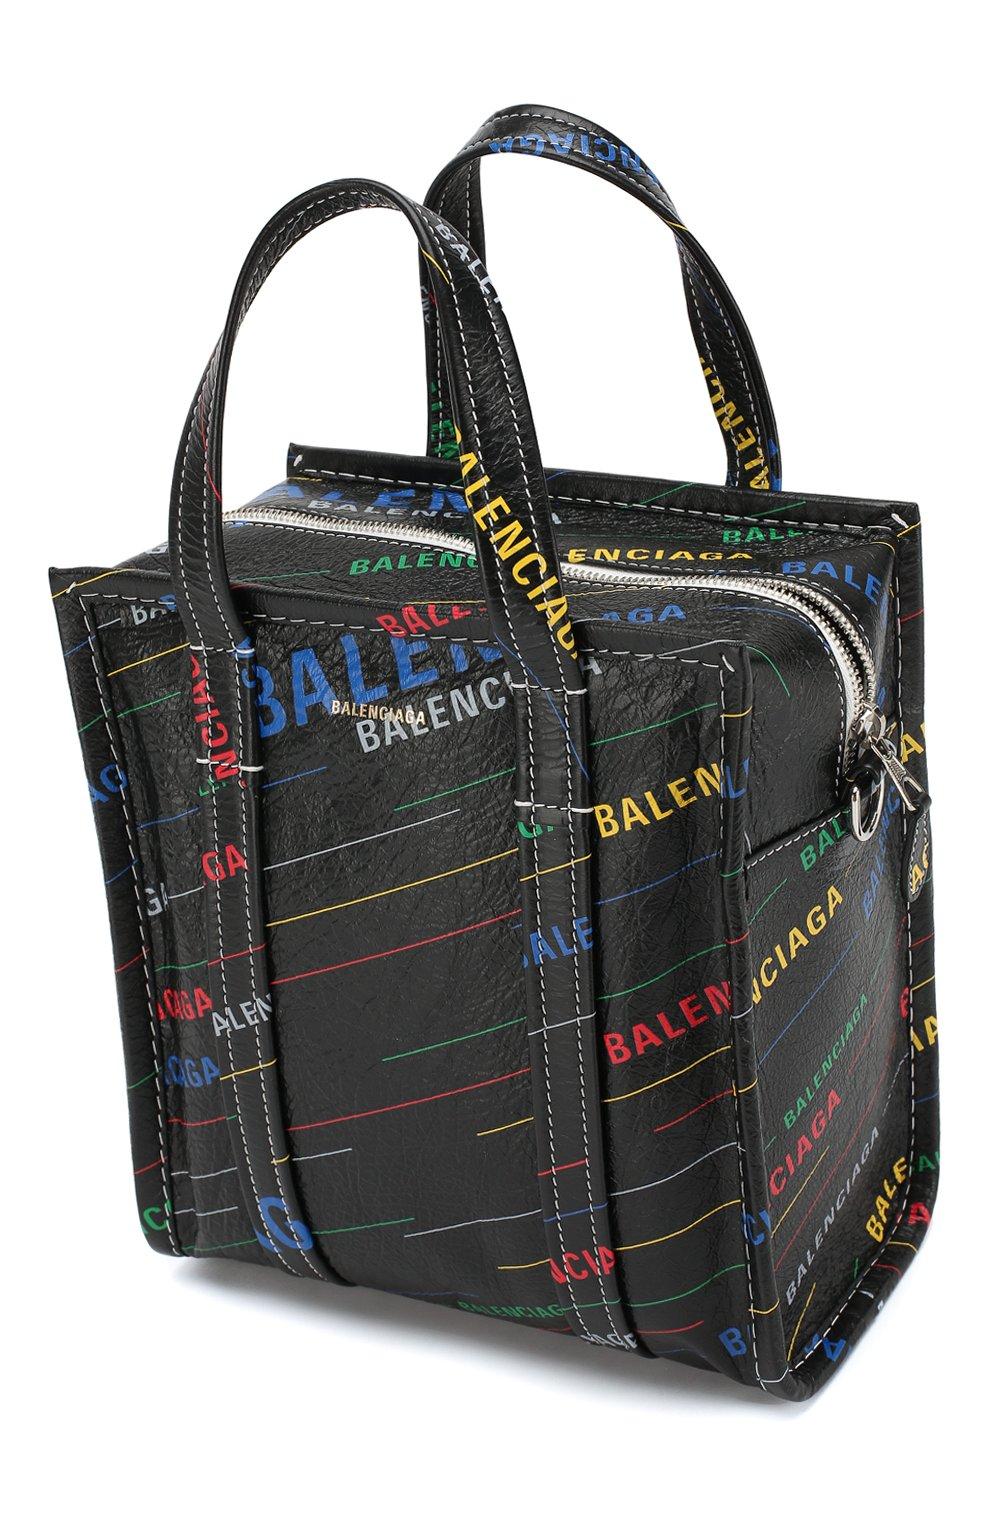 Сумка Bazar Shopper XS Balenciaga разноцветная цвета | Фото №4